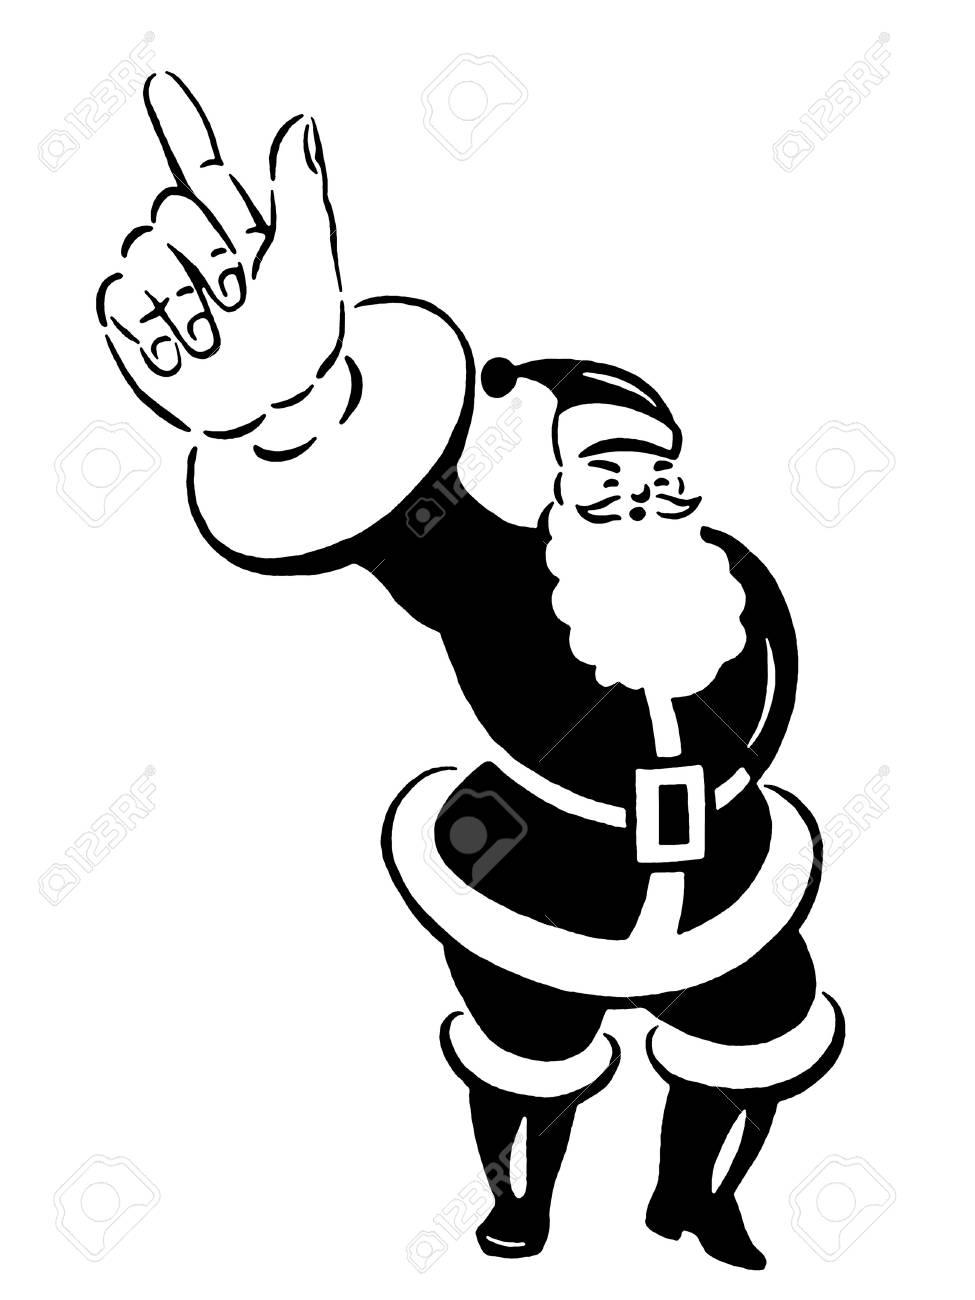 A Christmas inspired Santa illustration Stock Photo - 14917187